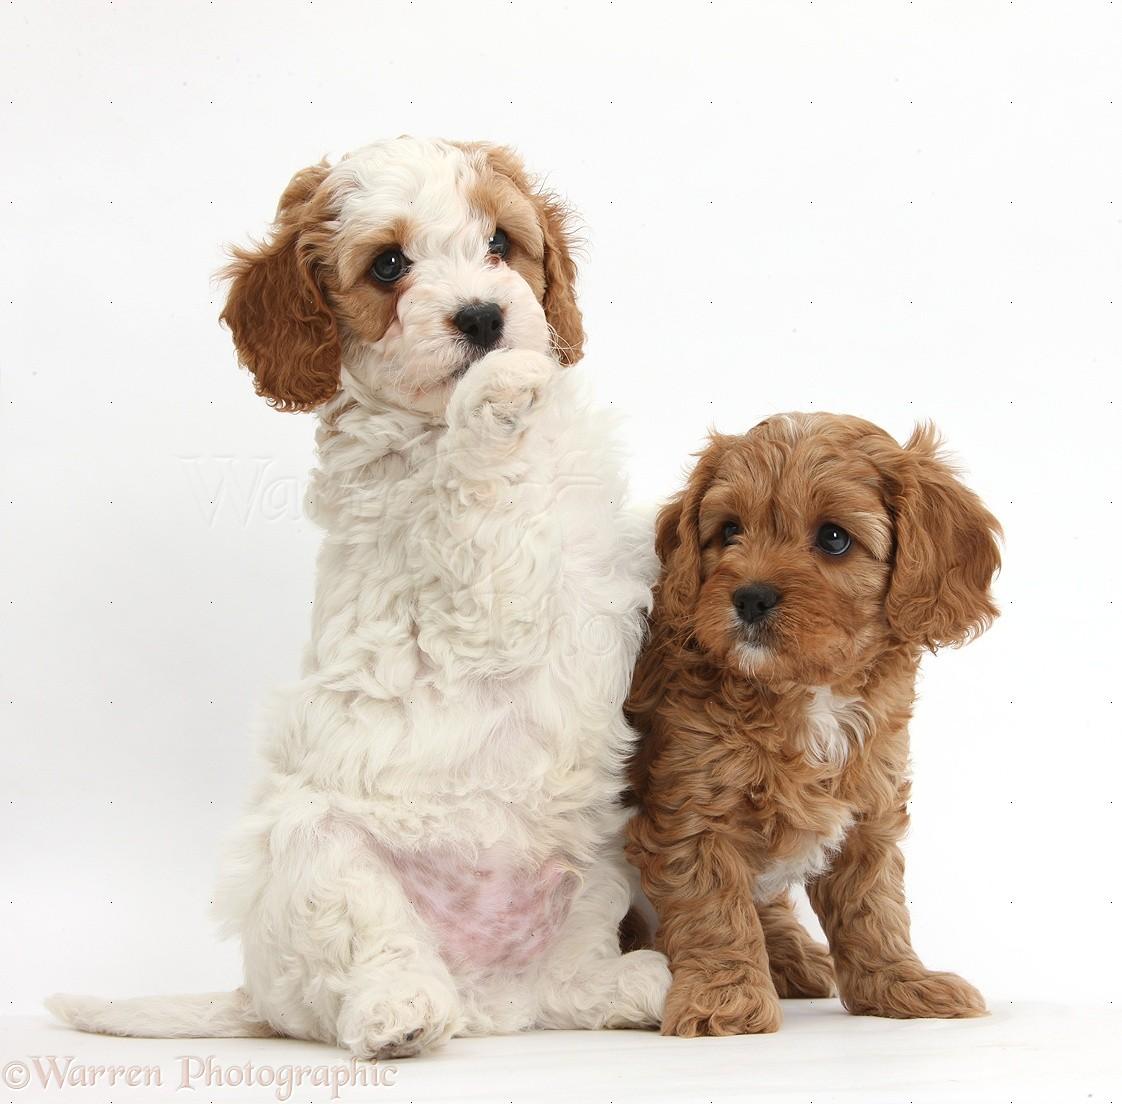 Dogs Cute Cavapoo Puppies Photo Wp40572